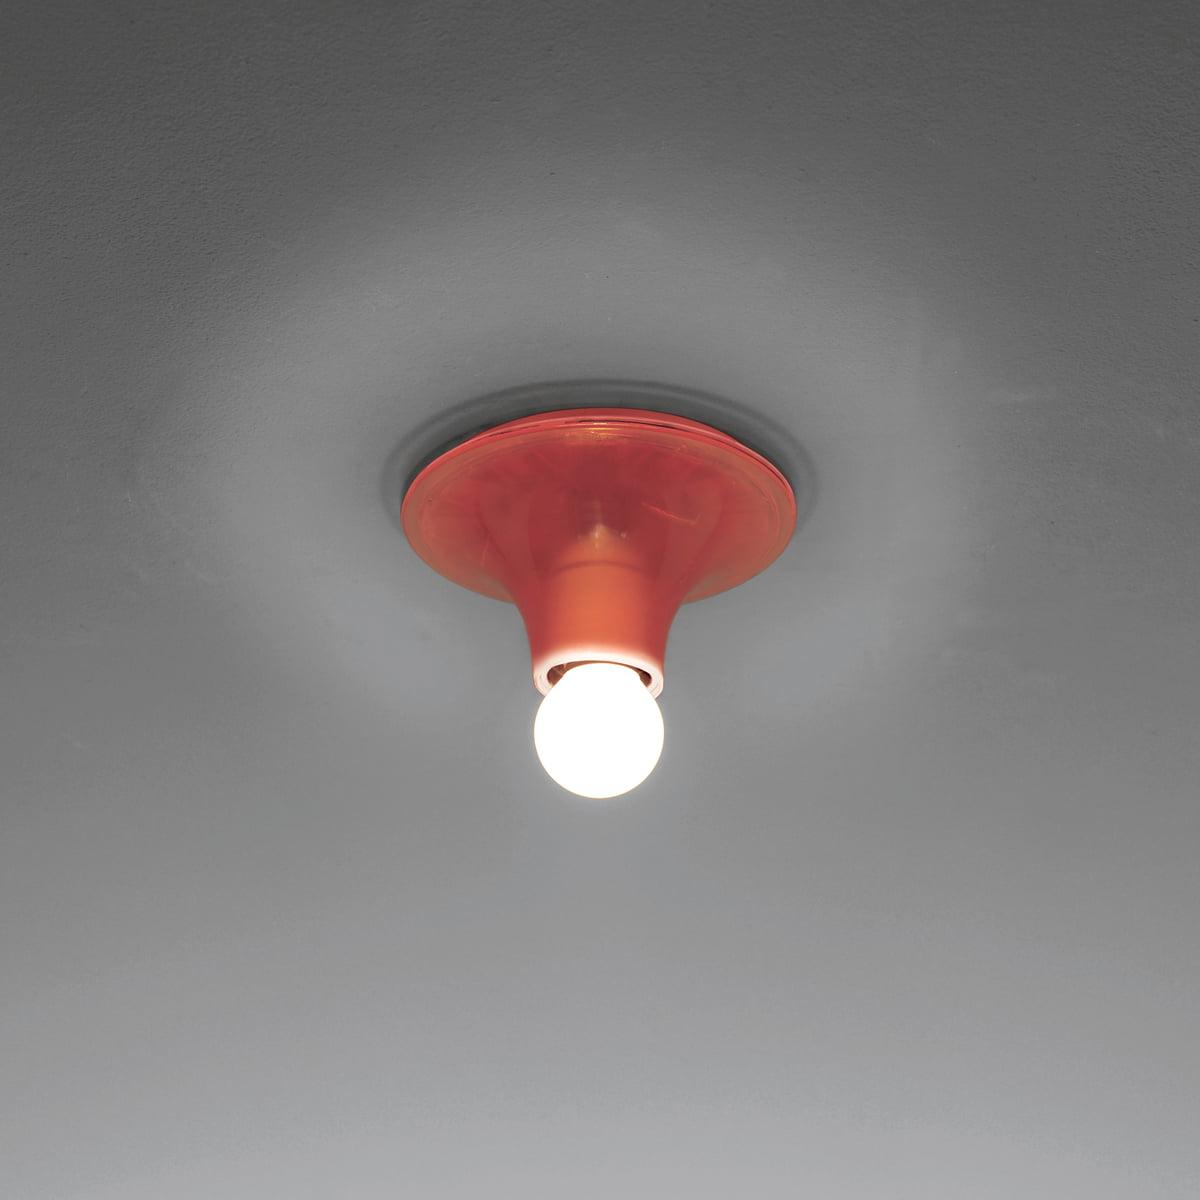 artemide ceiling lamp